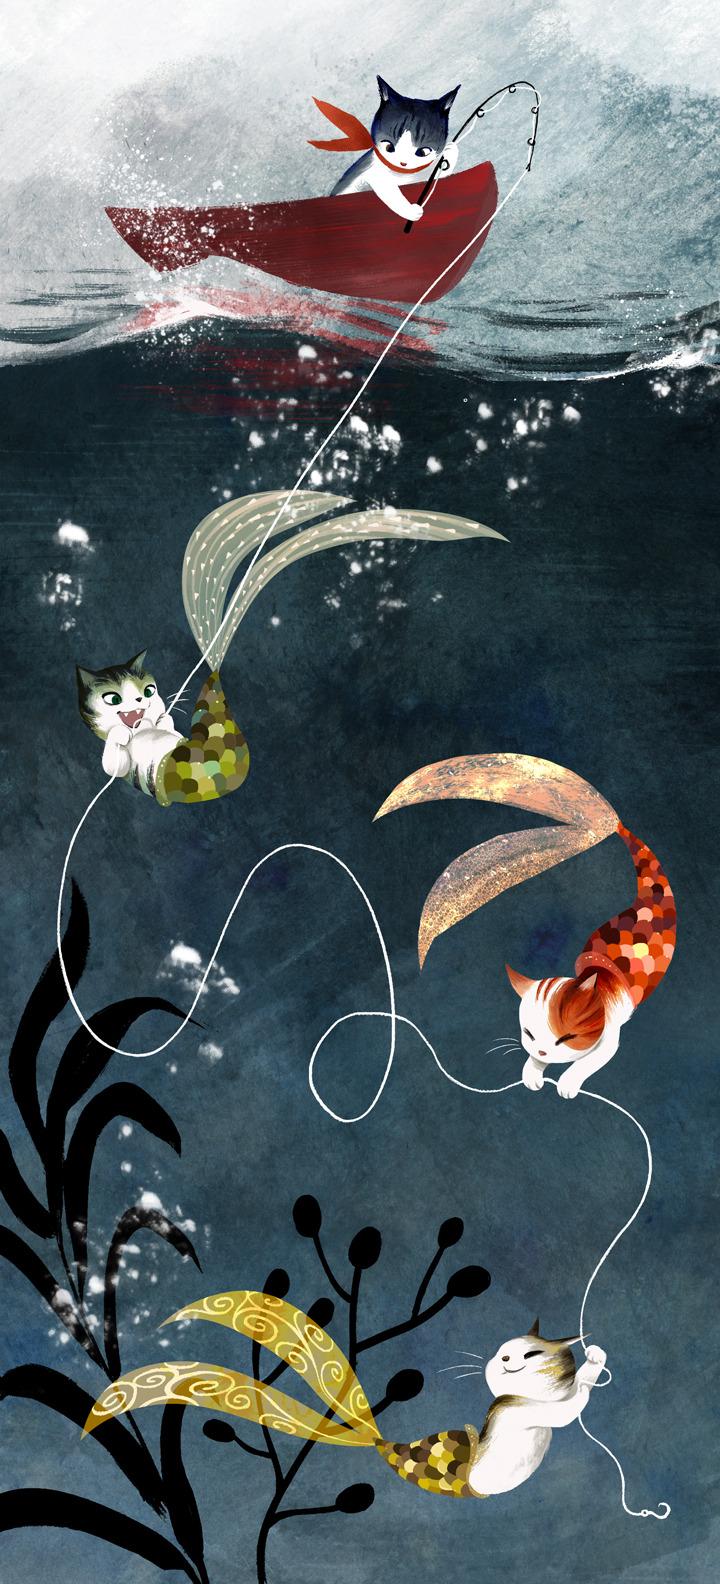 cat Illustration cats underwater fantasy ocean sea digital Mermaids fishing sailing artists on tumblr Children's Book Illustration children's art mercats vivedessins mermaid cats